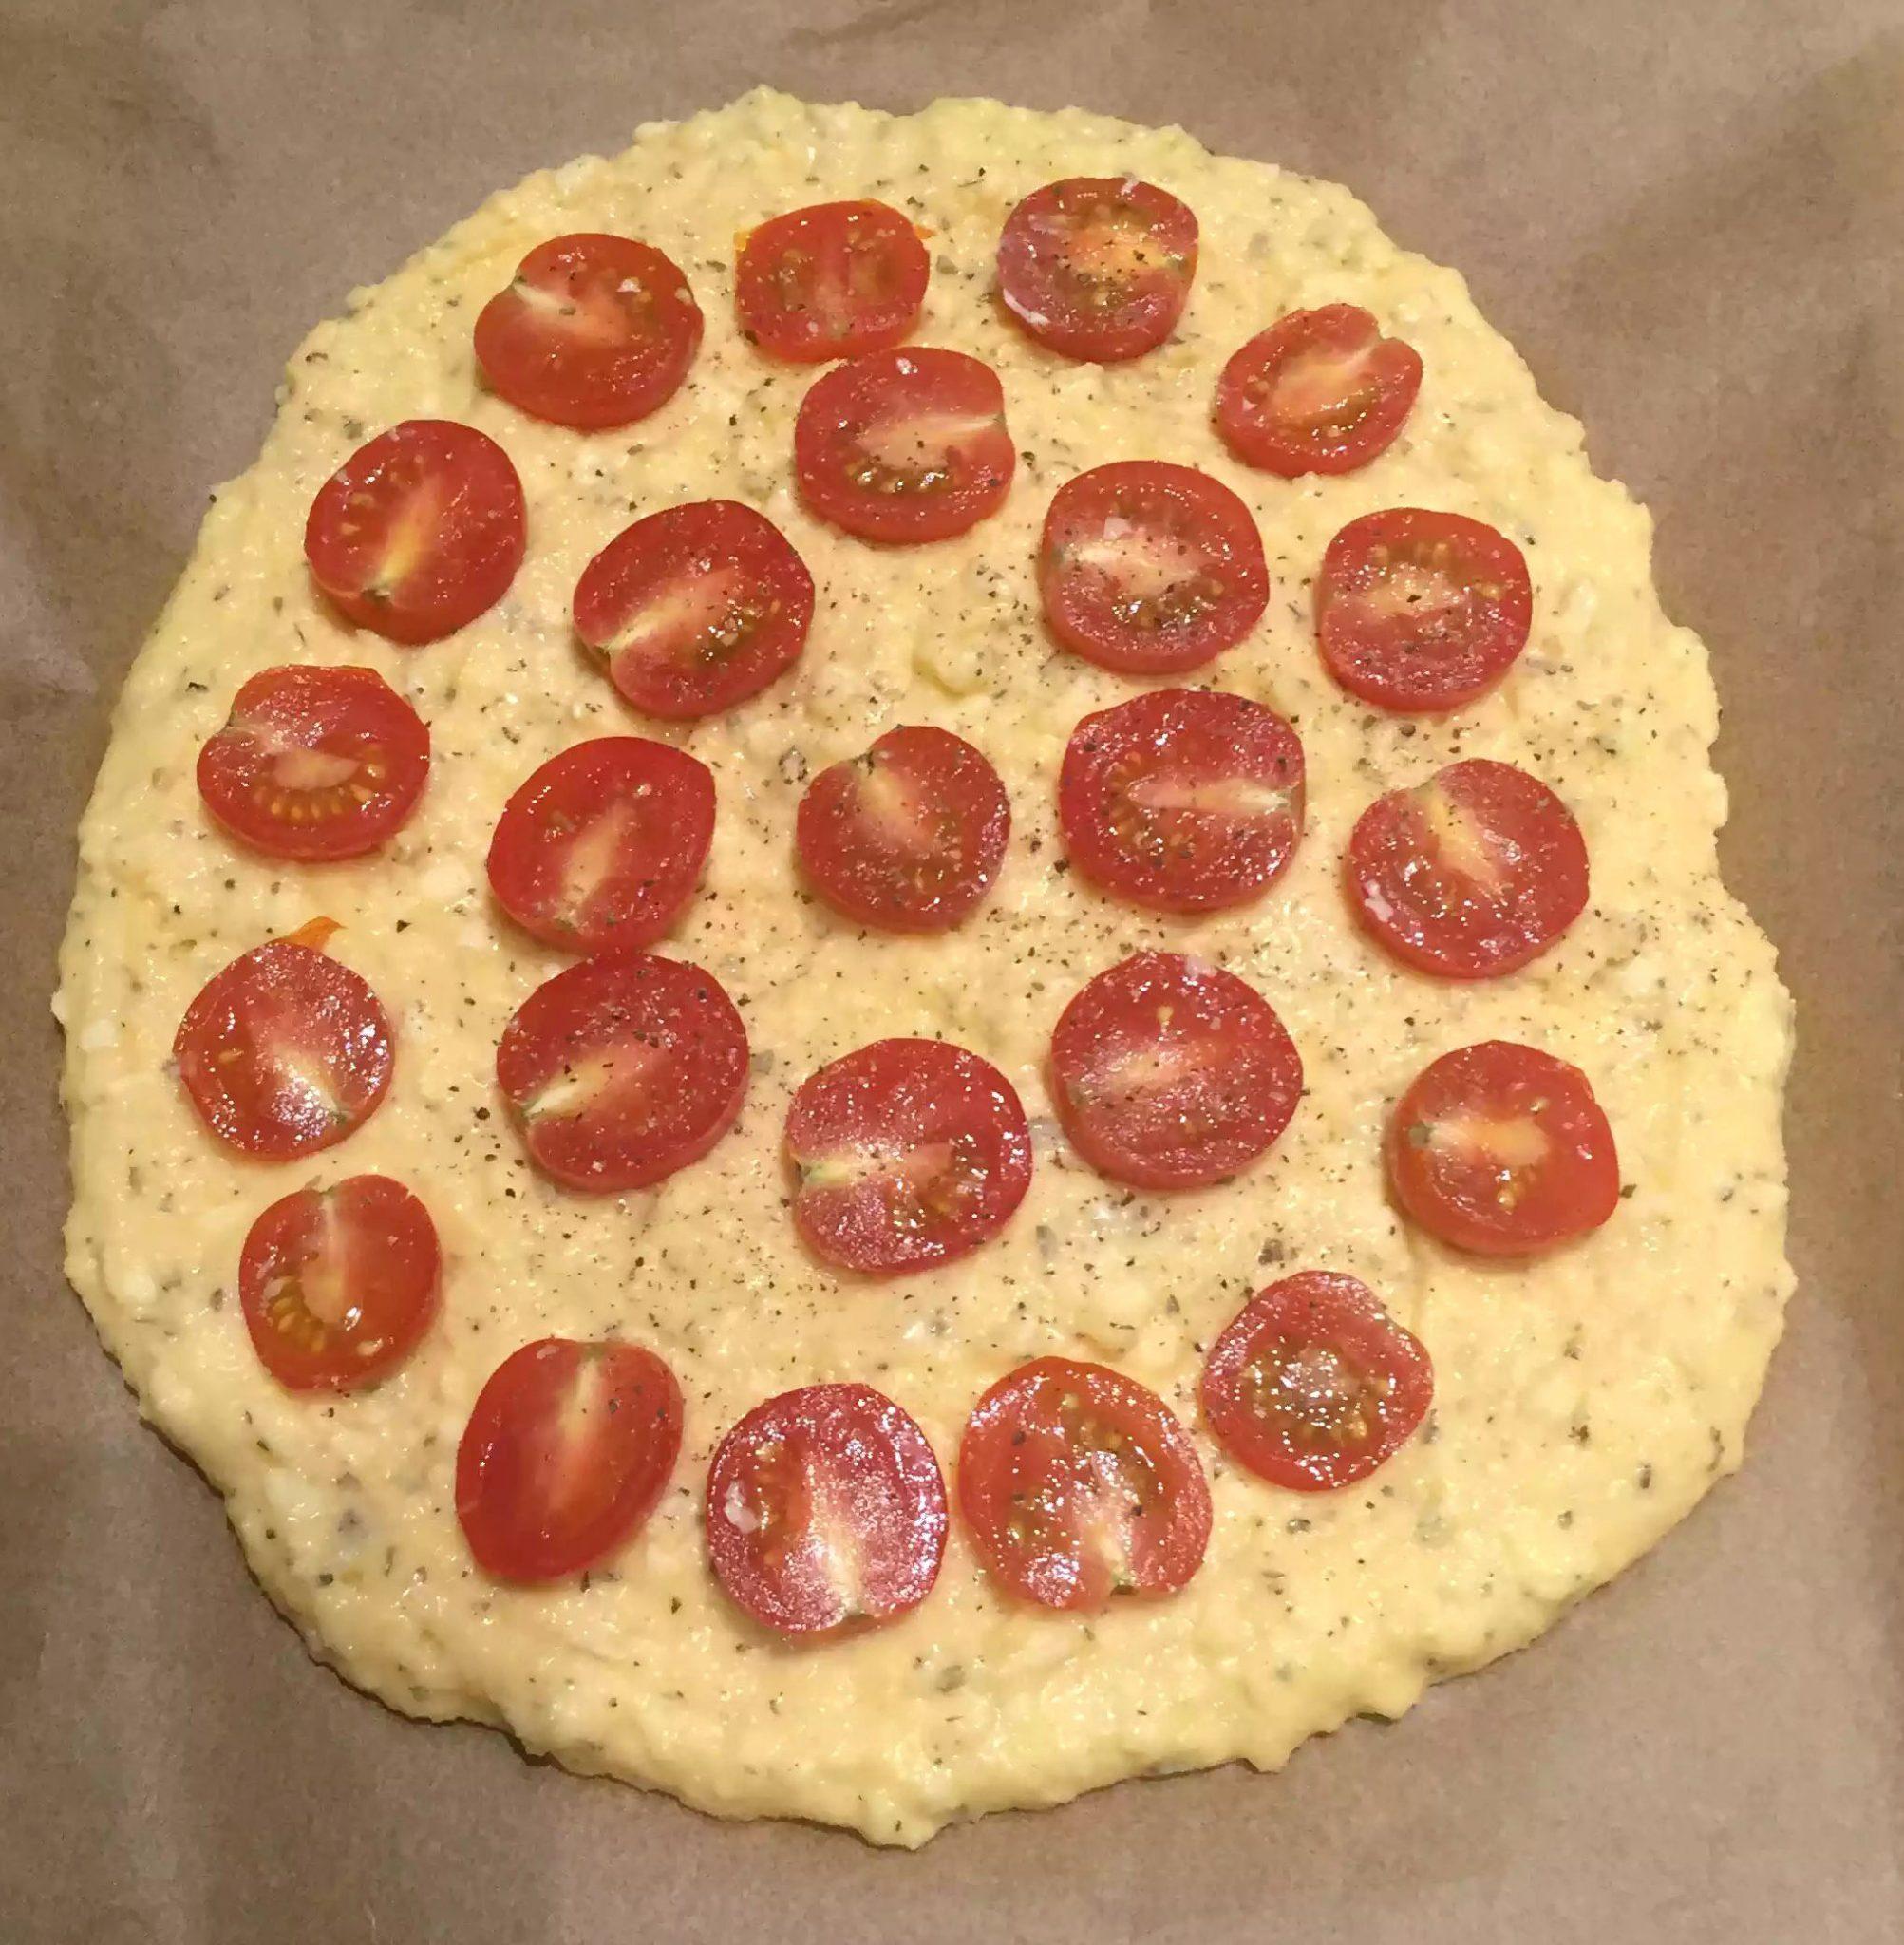 Cherry Tomato & Rocket Pesto Focaccia - Grain-Free Gluten-Free SCD Paleo Eggs Yoghurt Pizza Base Coconut Flour